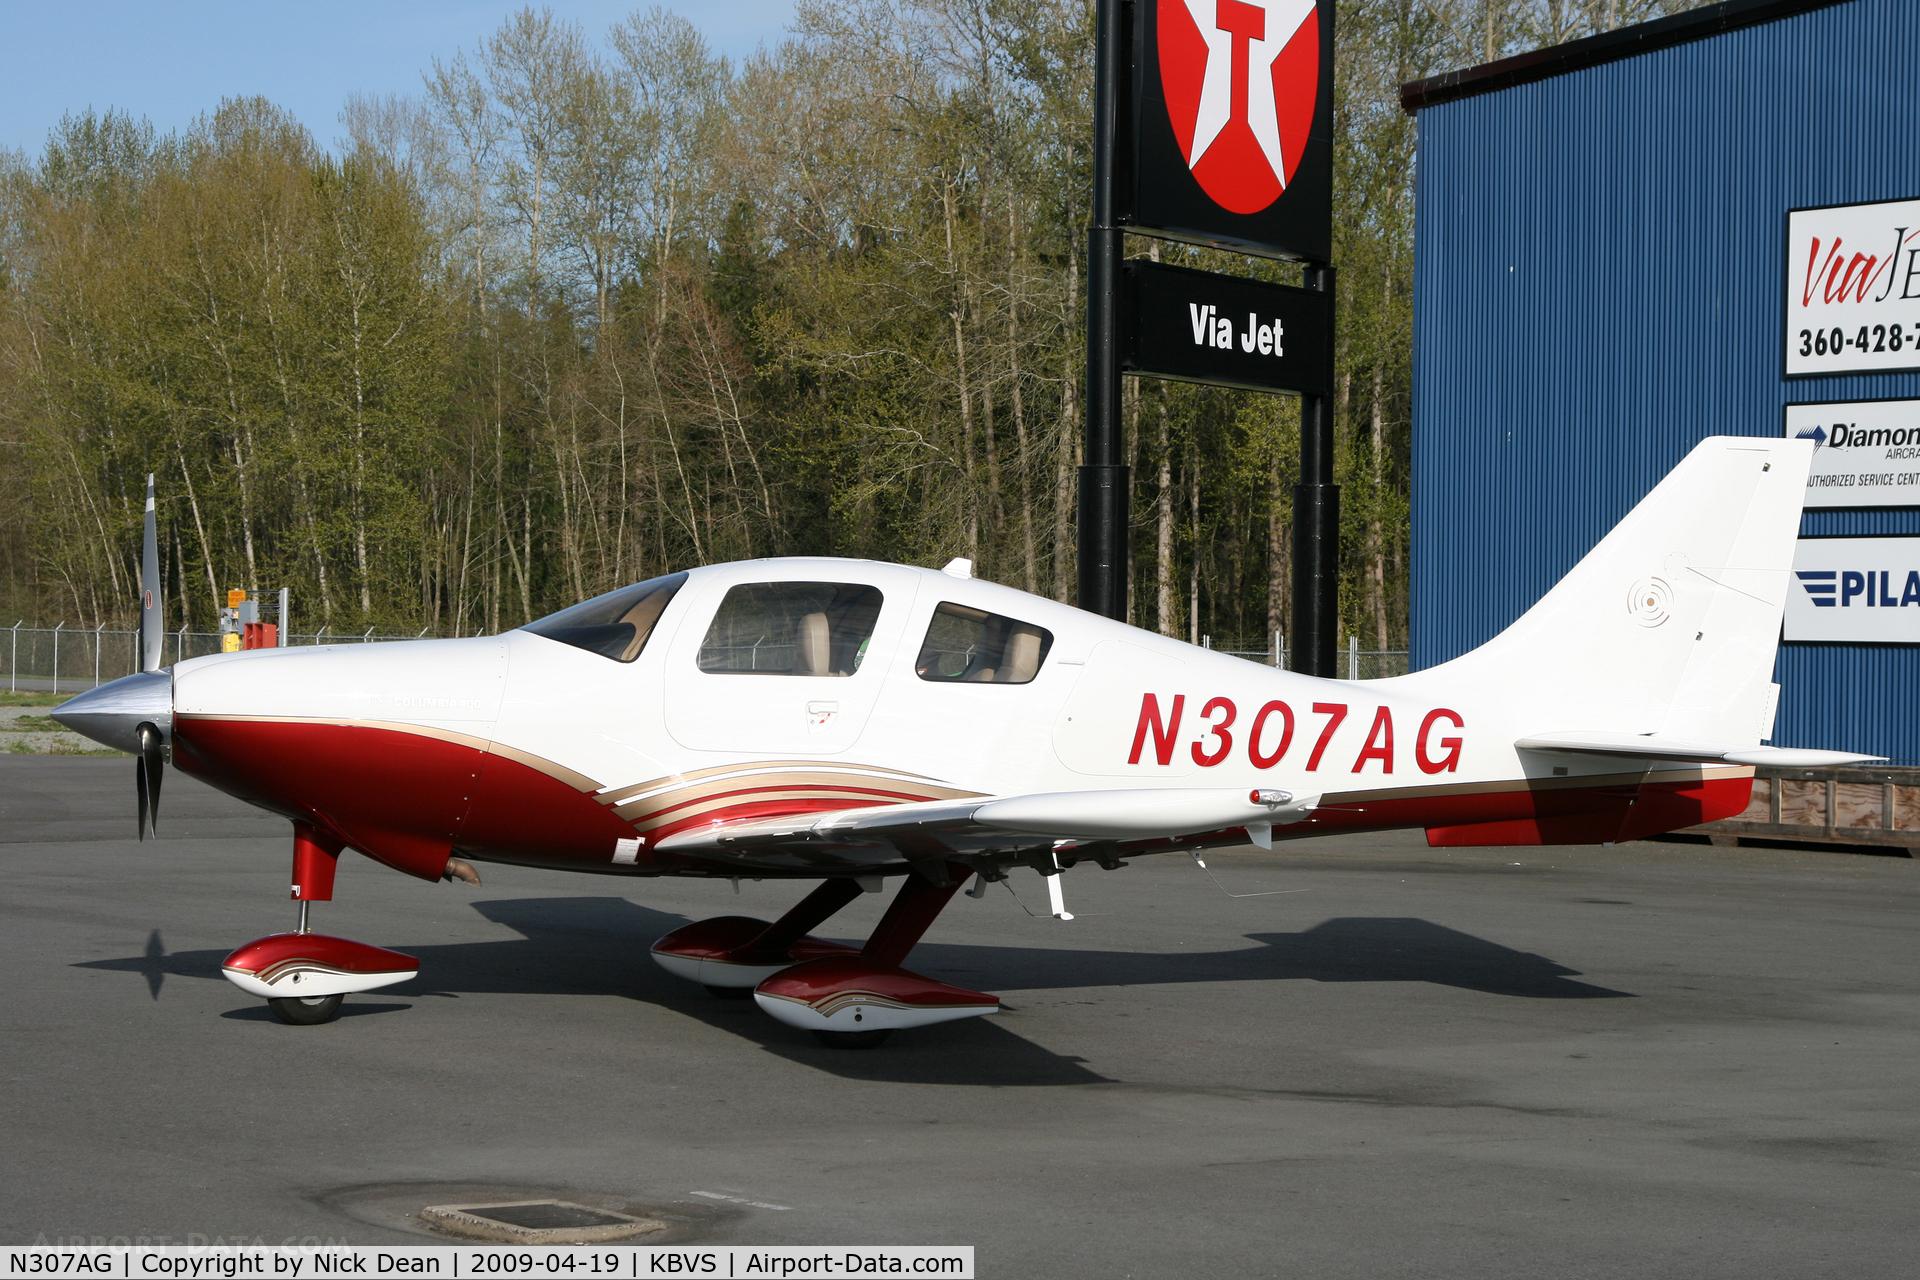 N307AG, 2006 Columbia Aircraft Mfg LC41-550FG C/N 41595, KBVS